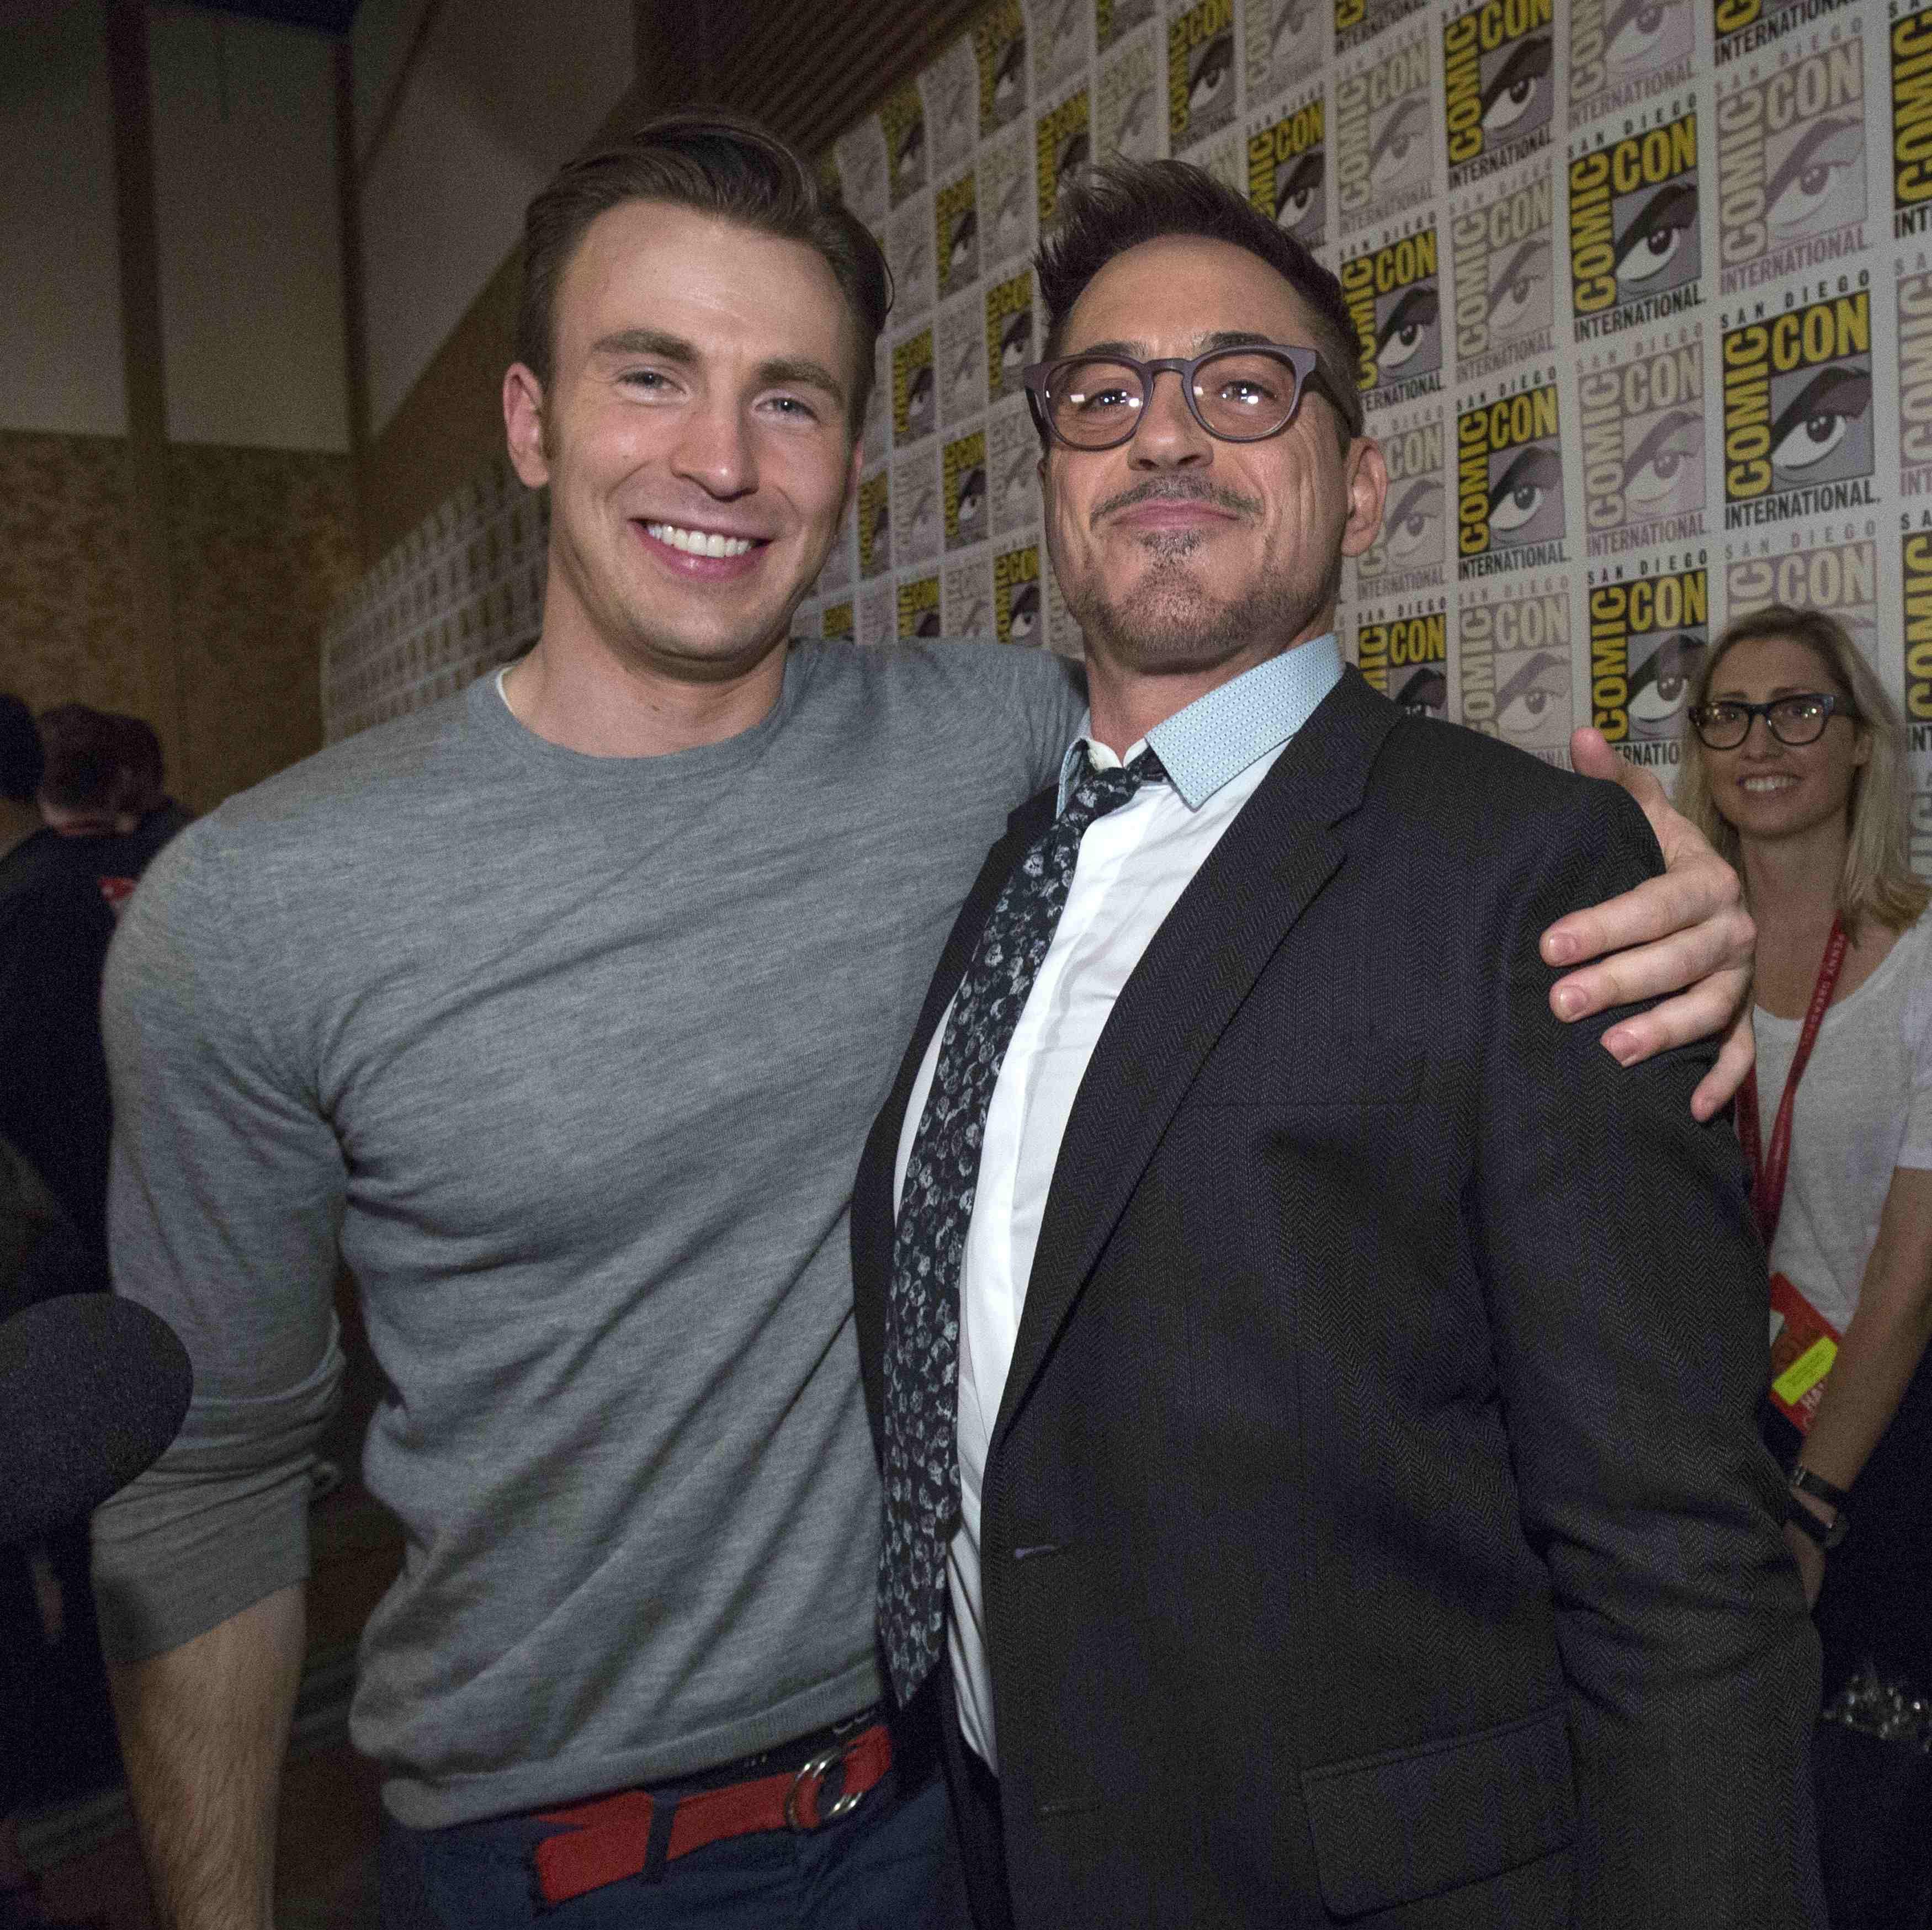 Comic-Con International 2014: Marvel Studios Panel - hq0012 - Incredibly Downey Jr. || Photogallery